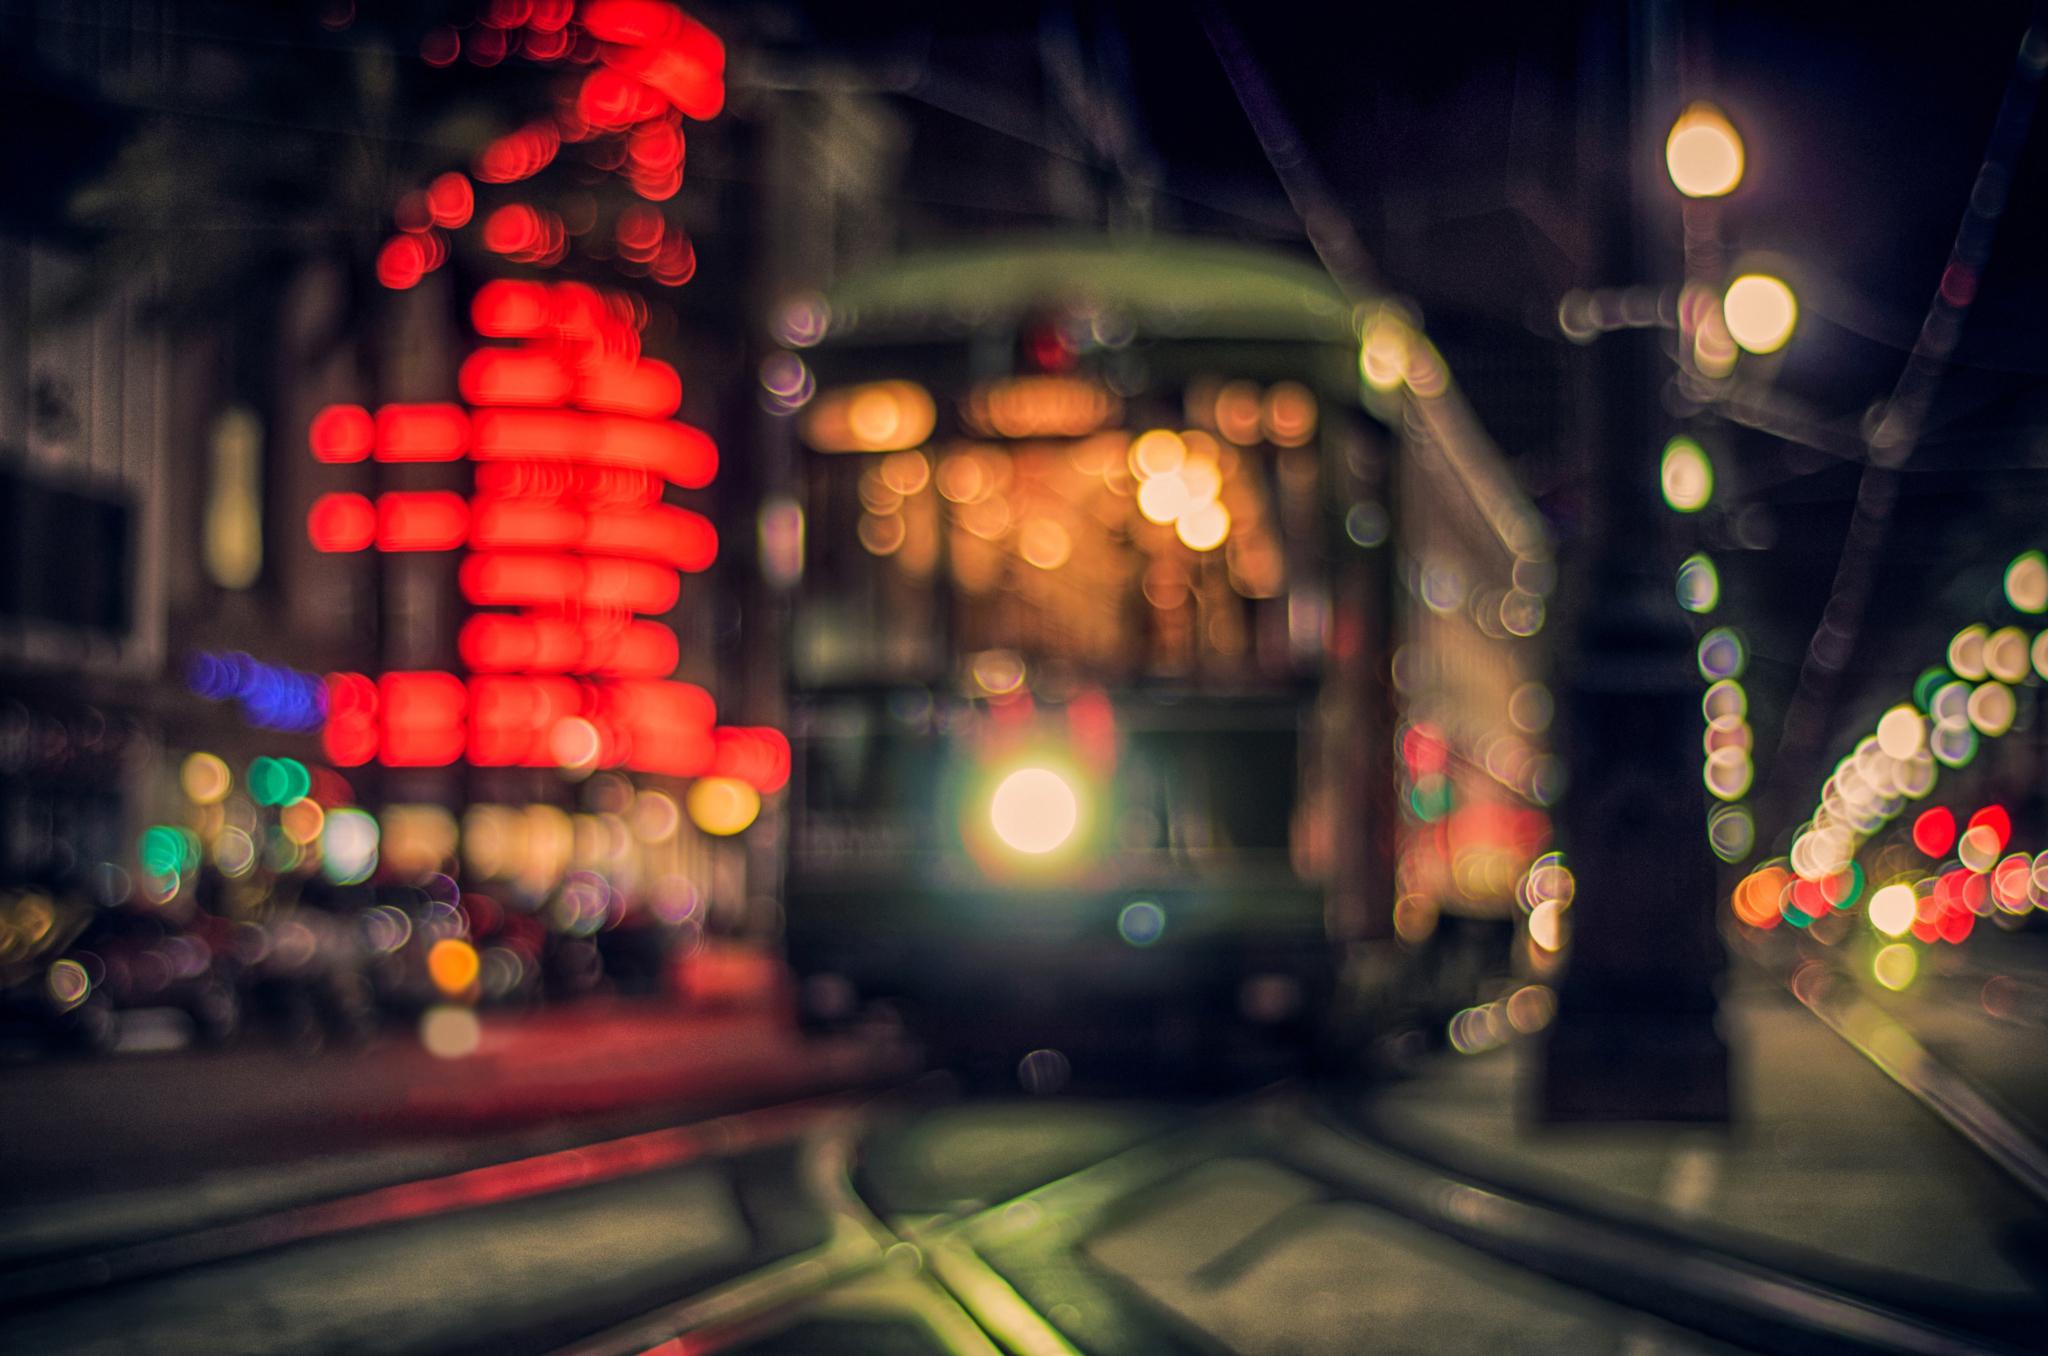 Франция дороги ночь фонари  № 2229301 бесплатно